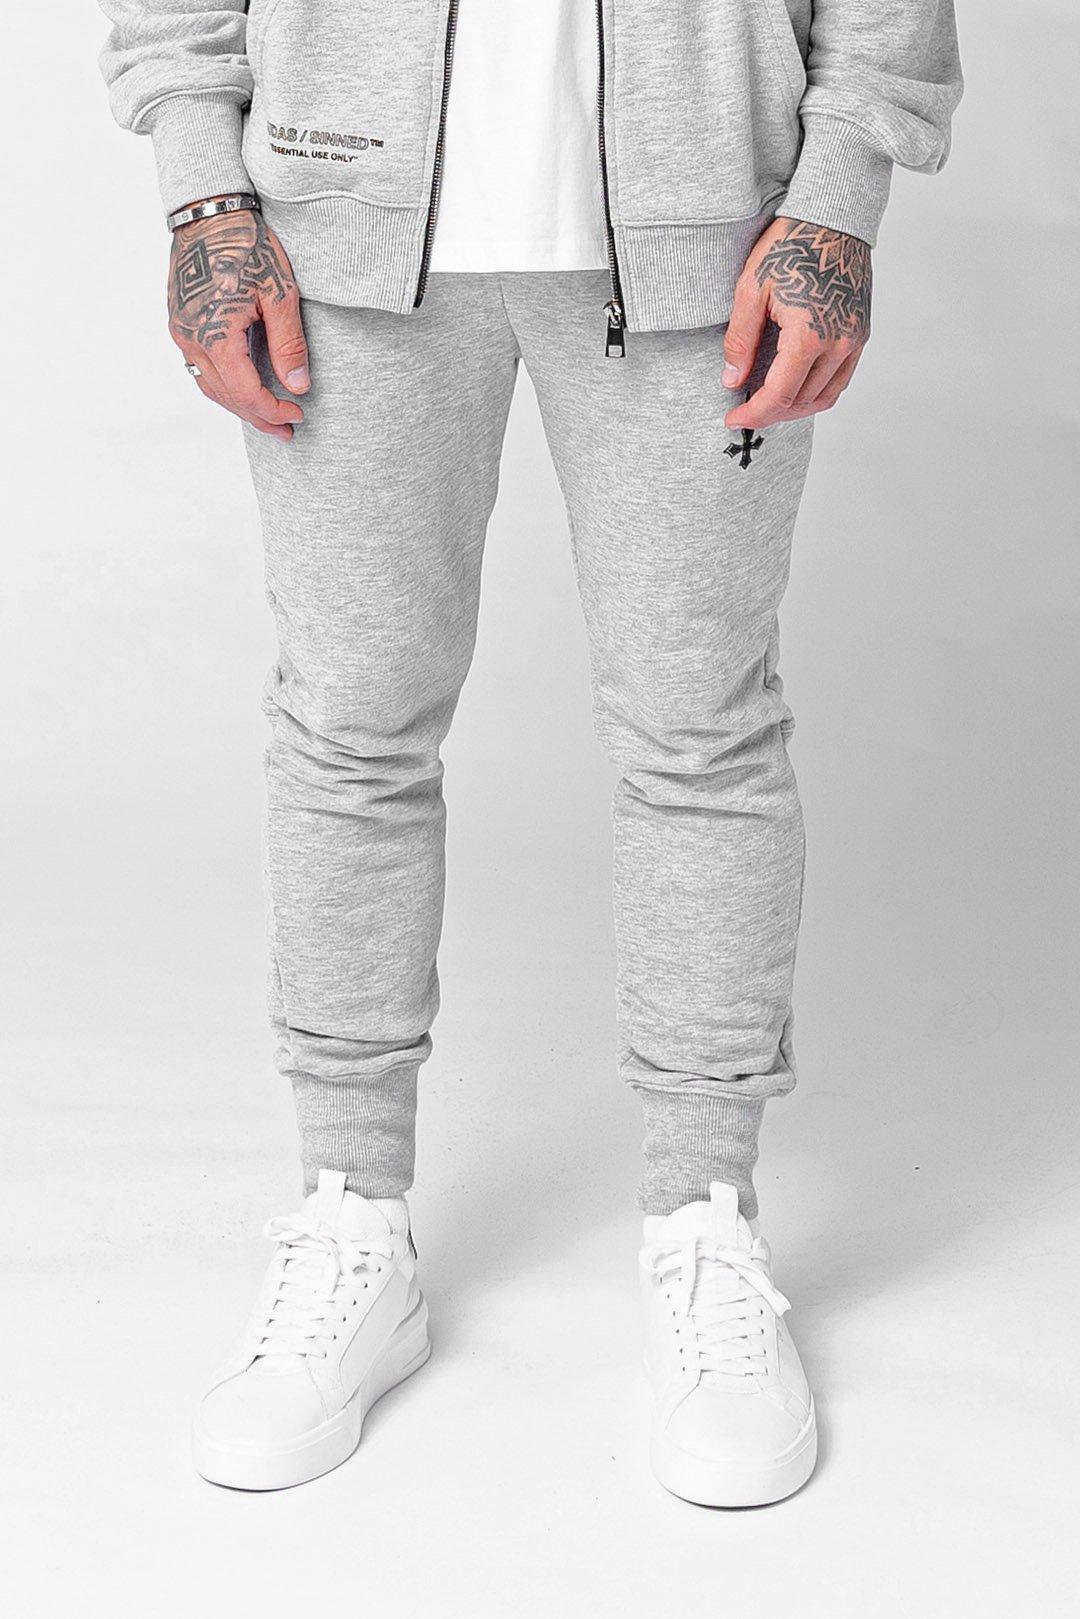 Base Essential Men's Joggers - Grey Marl, Medium